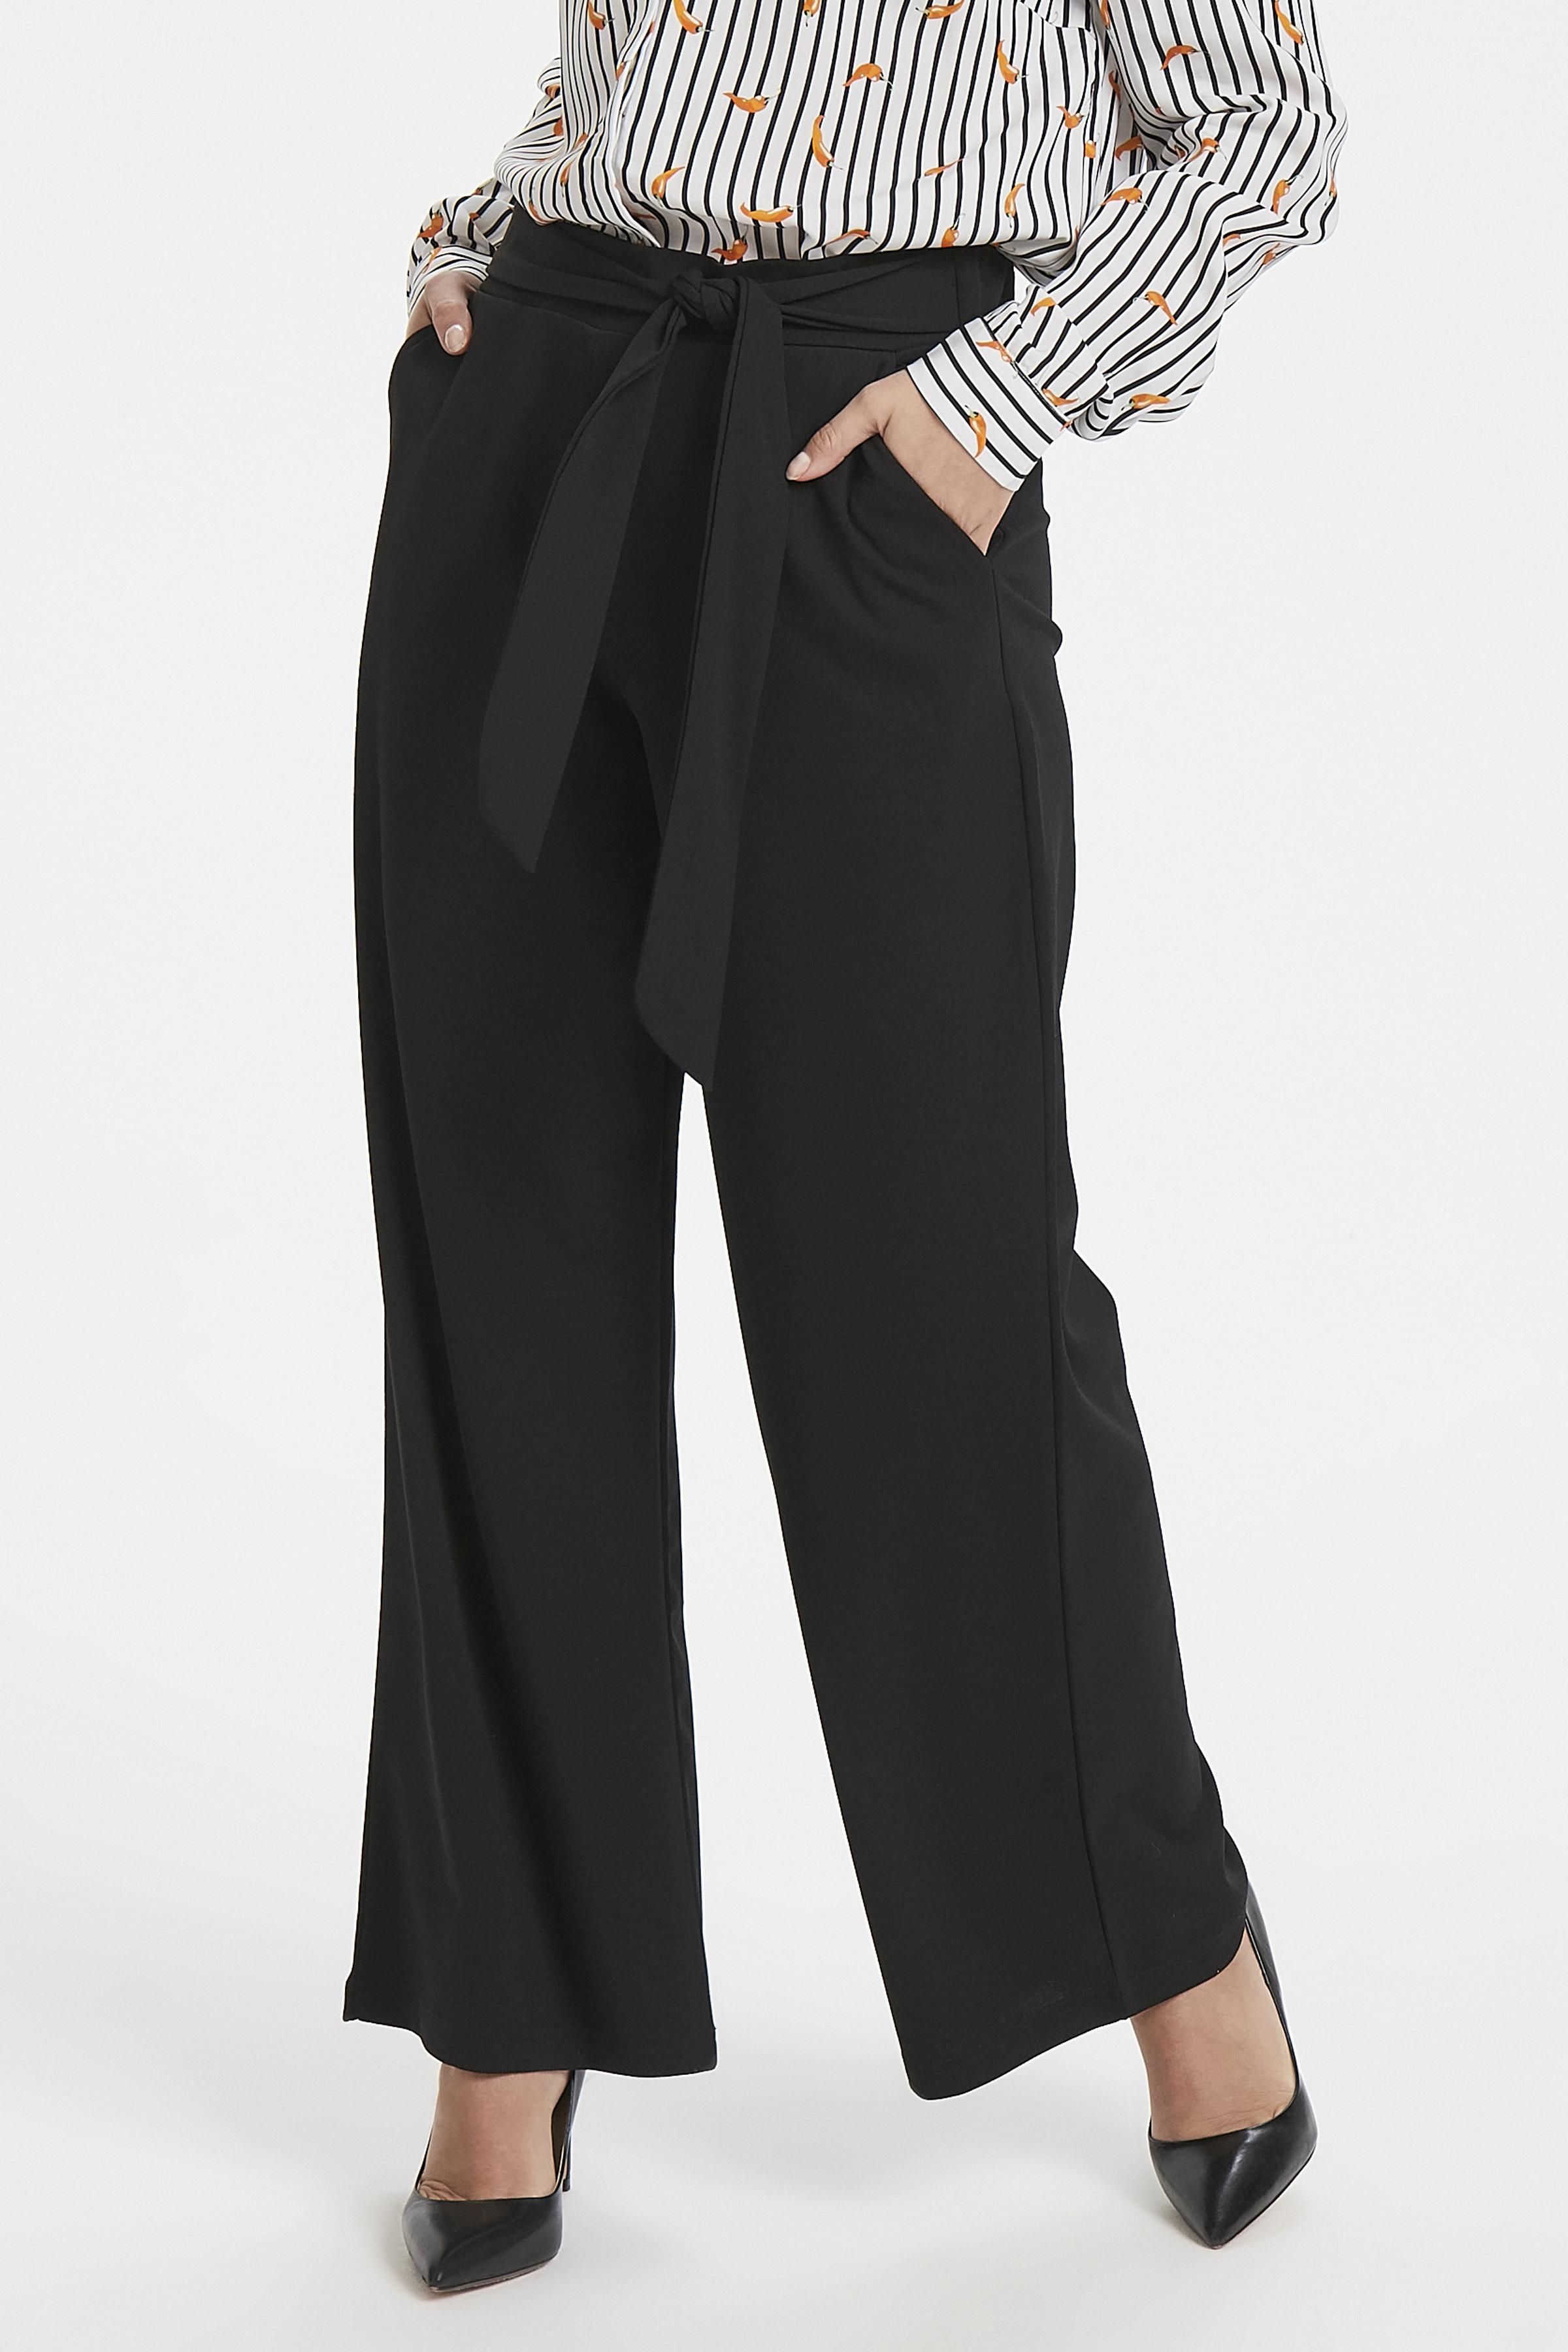 Black Pants Casual fra b.young – Køb Black Pants Casual fra str. XS-XXL her